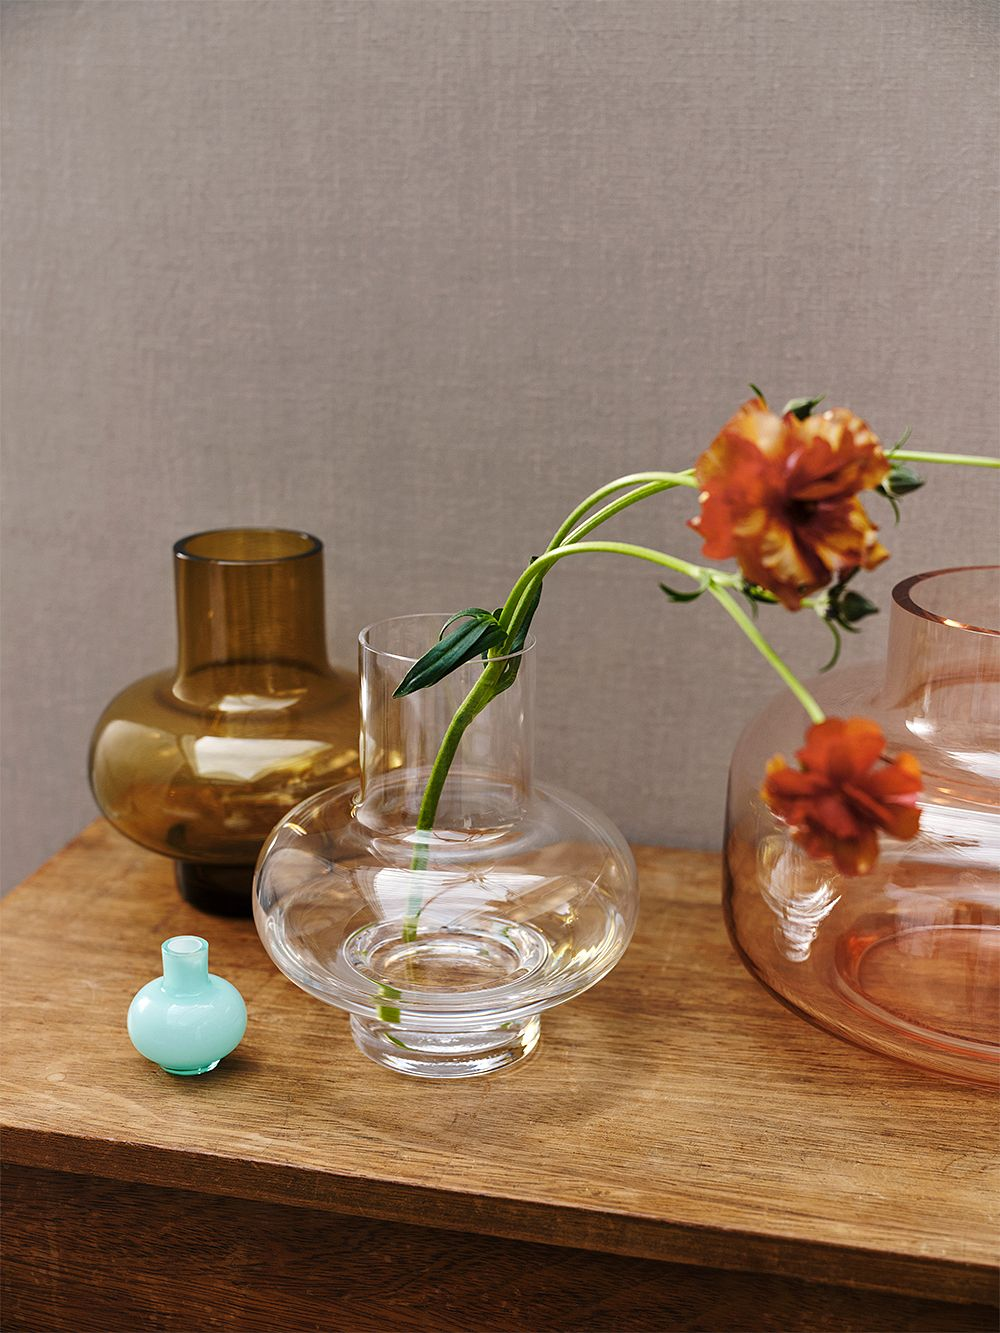 The Umpu vase by Marimekko